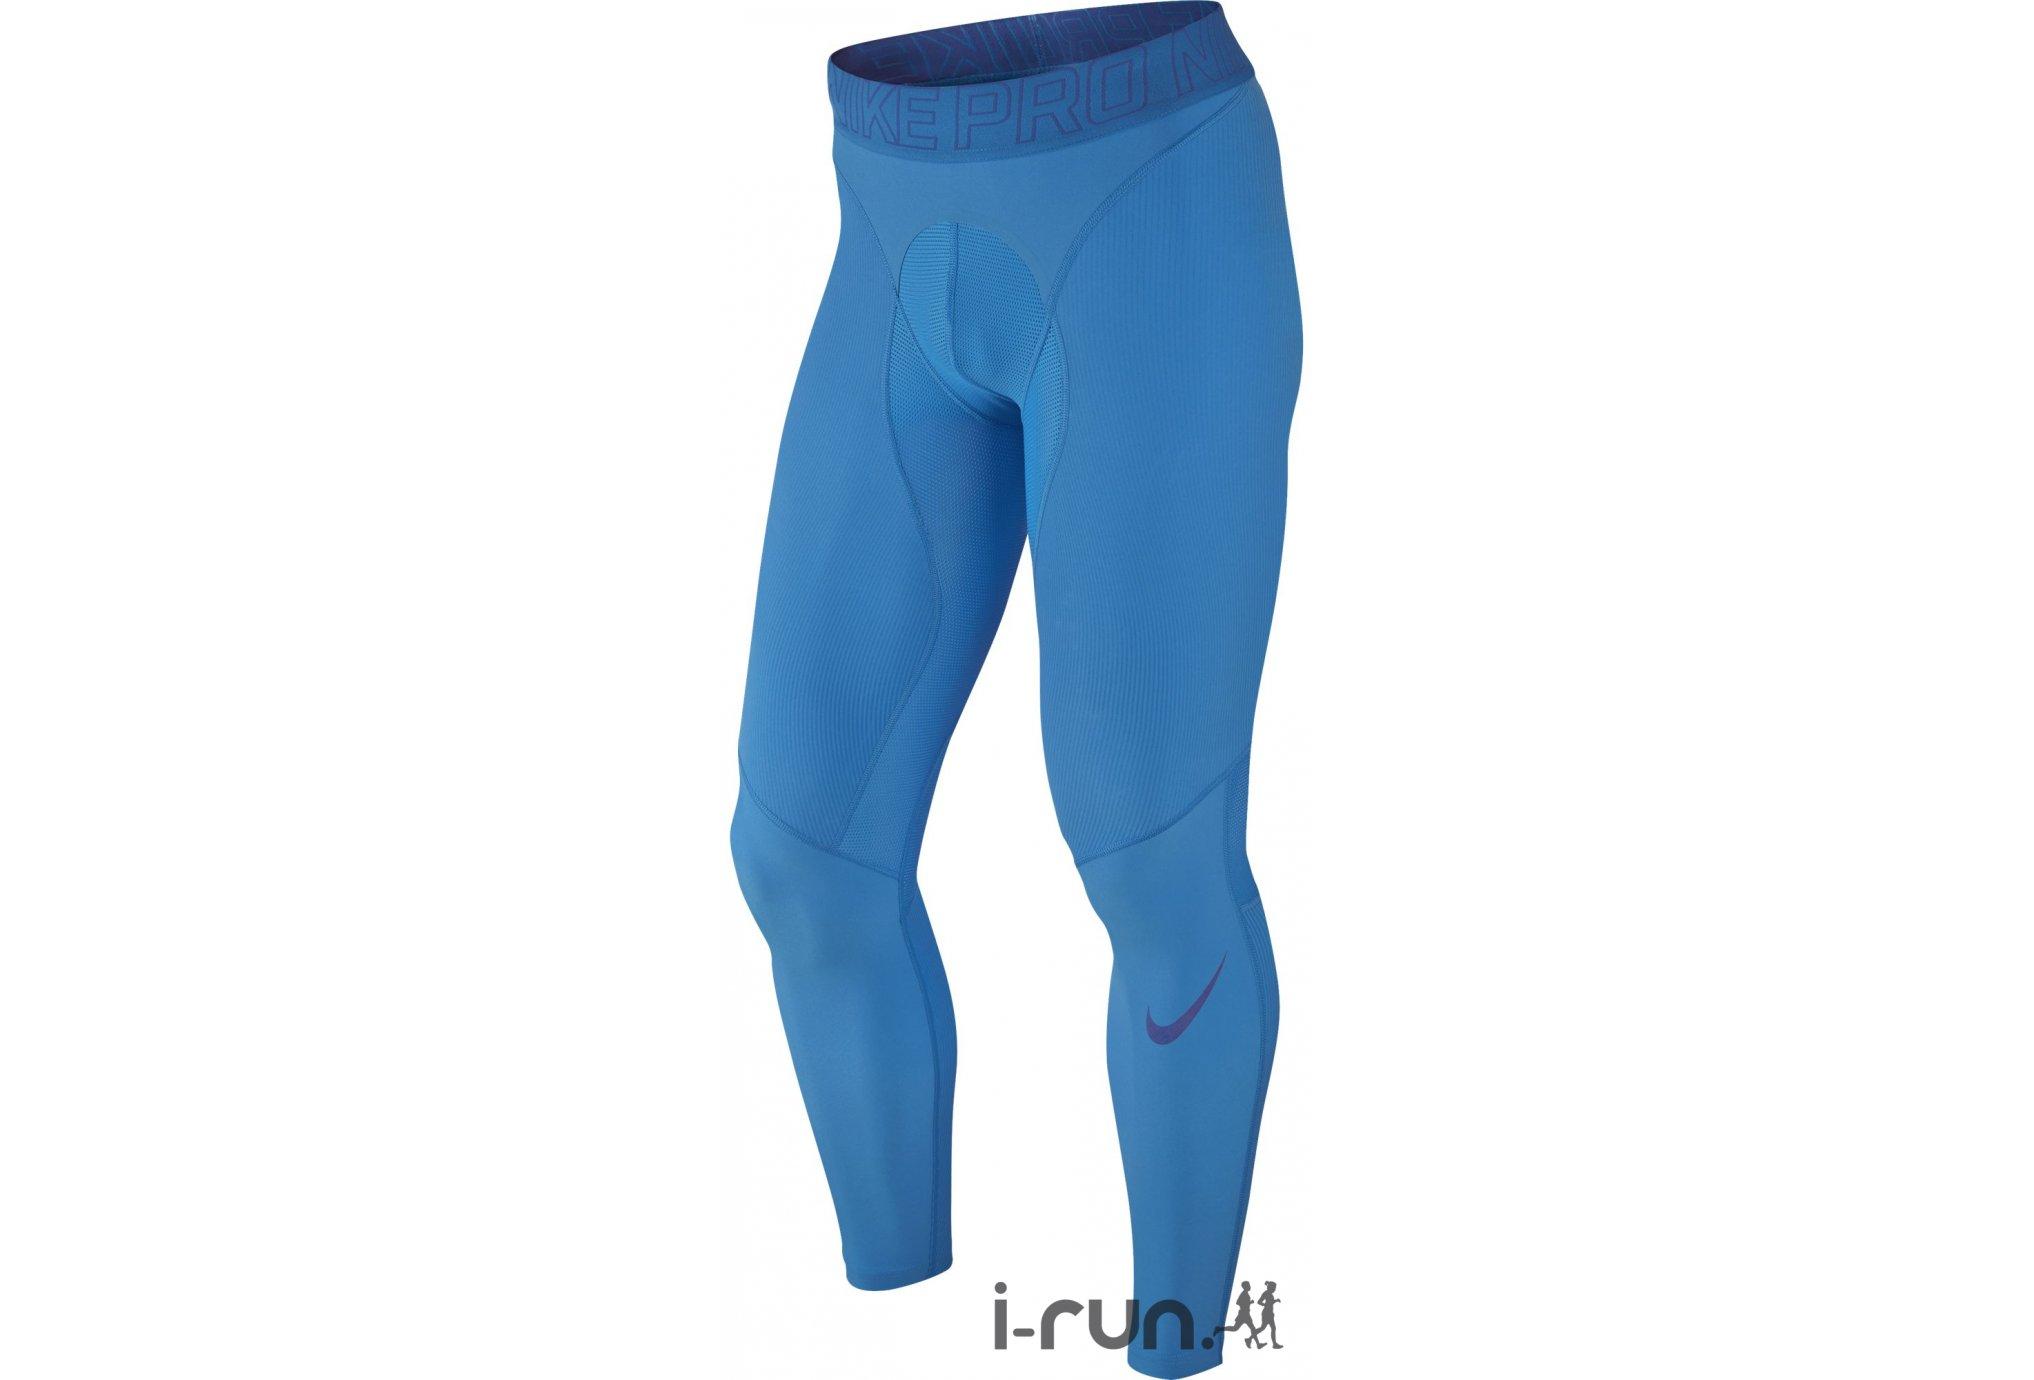 Trail Session - Nike Pro Hypercompression M vêtement running homme d990c011460d